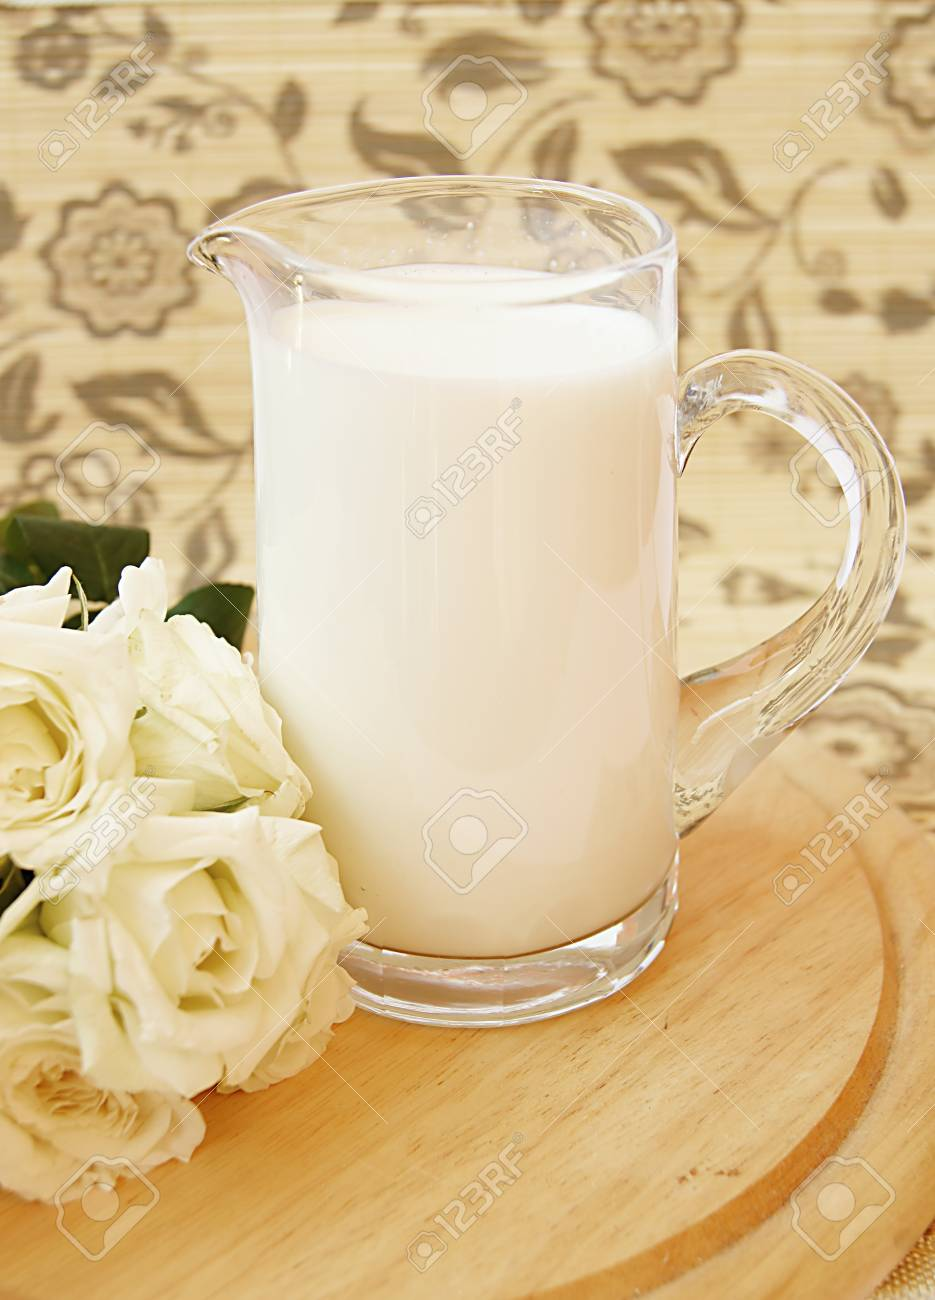 milk in the glass Stock Photo - 10747921